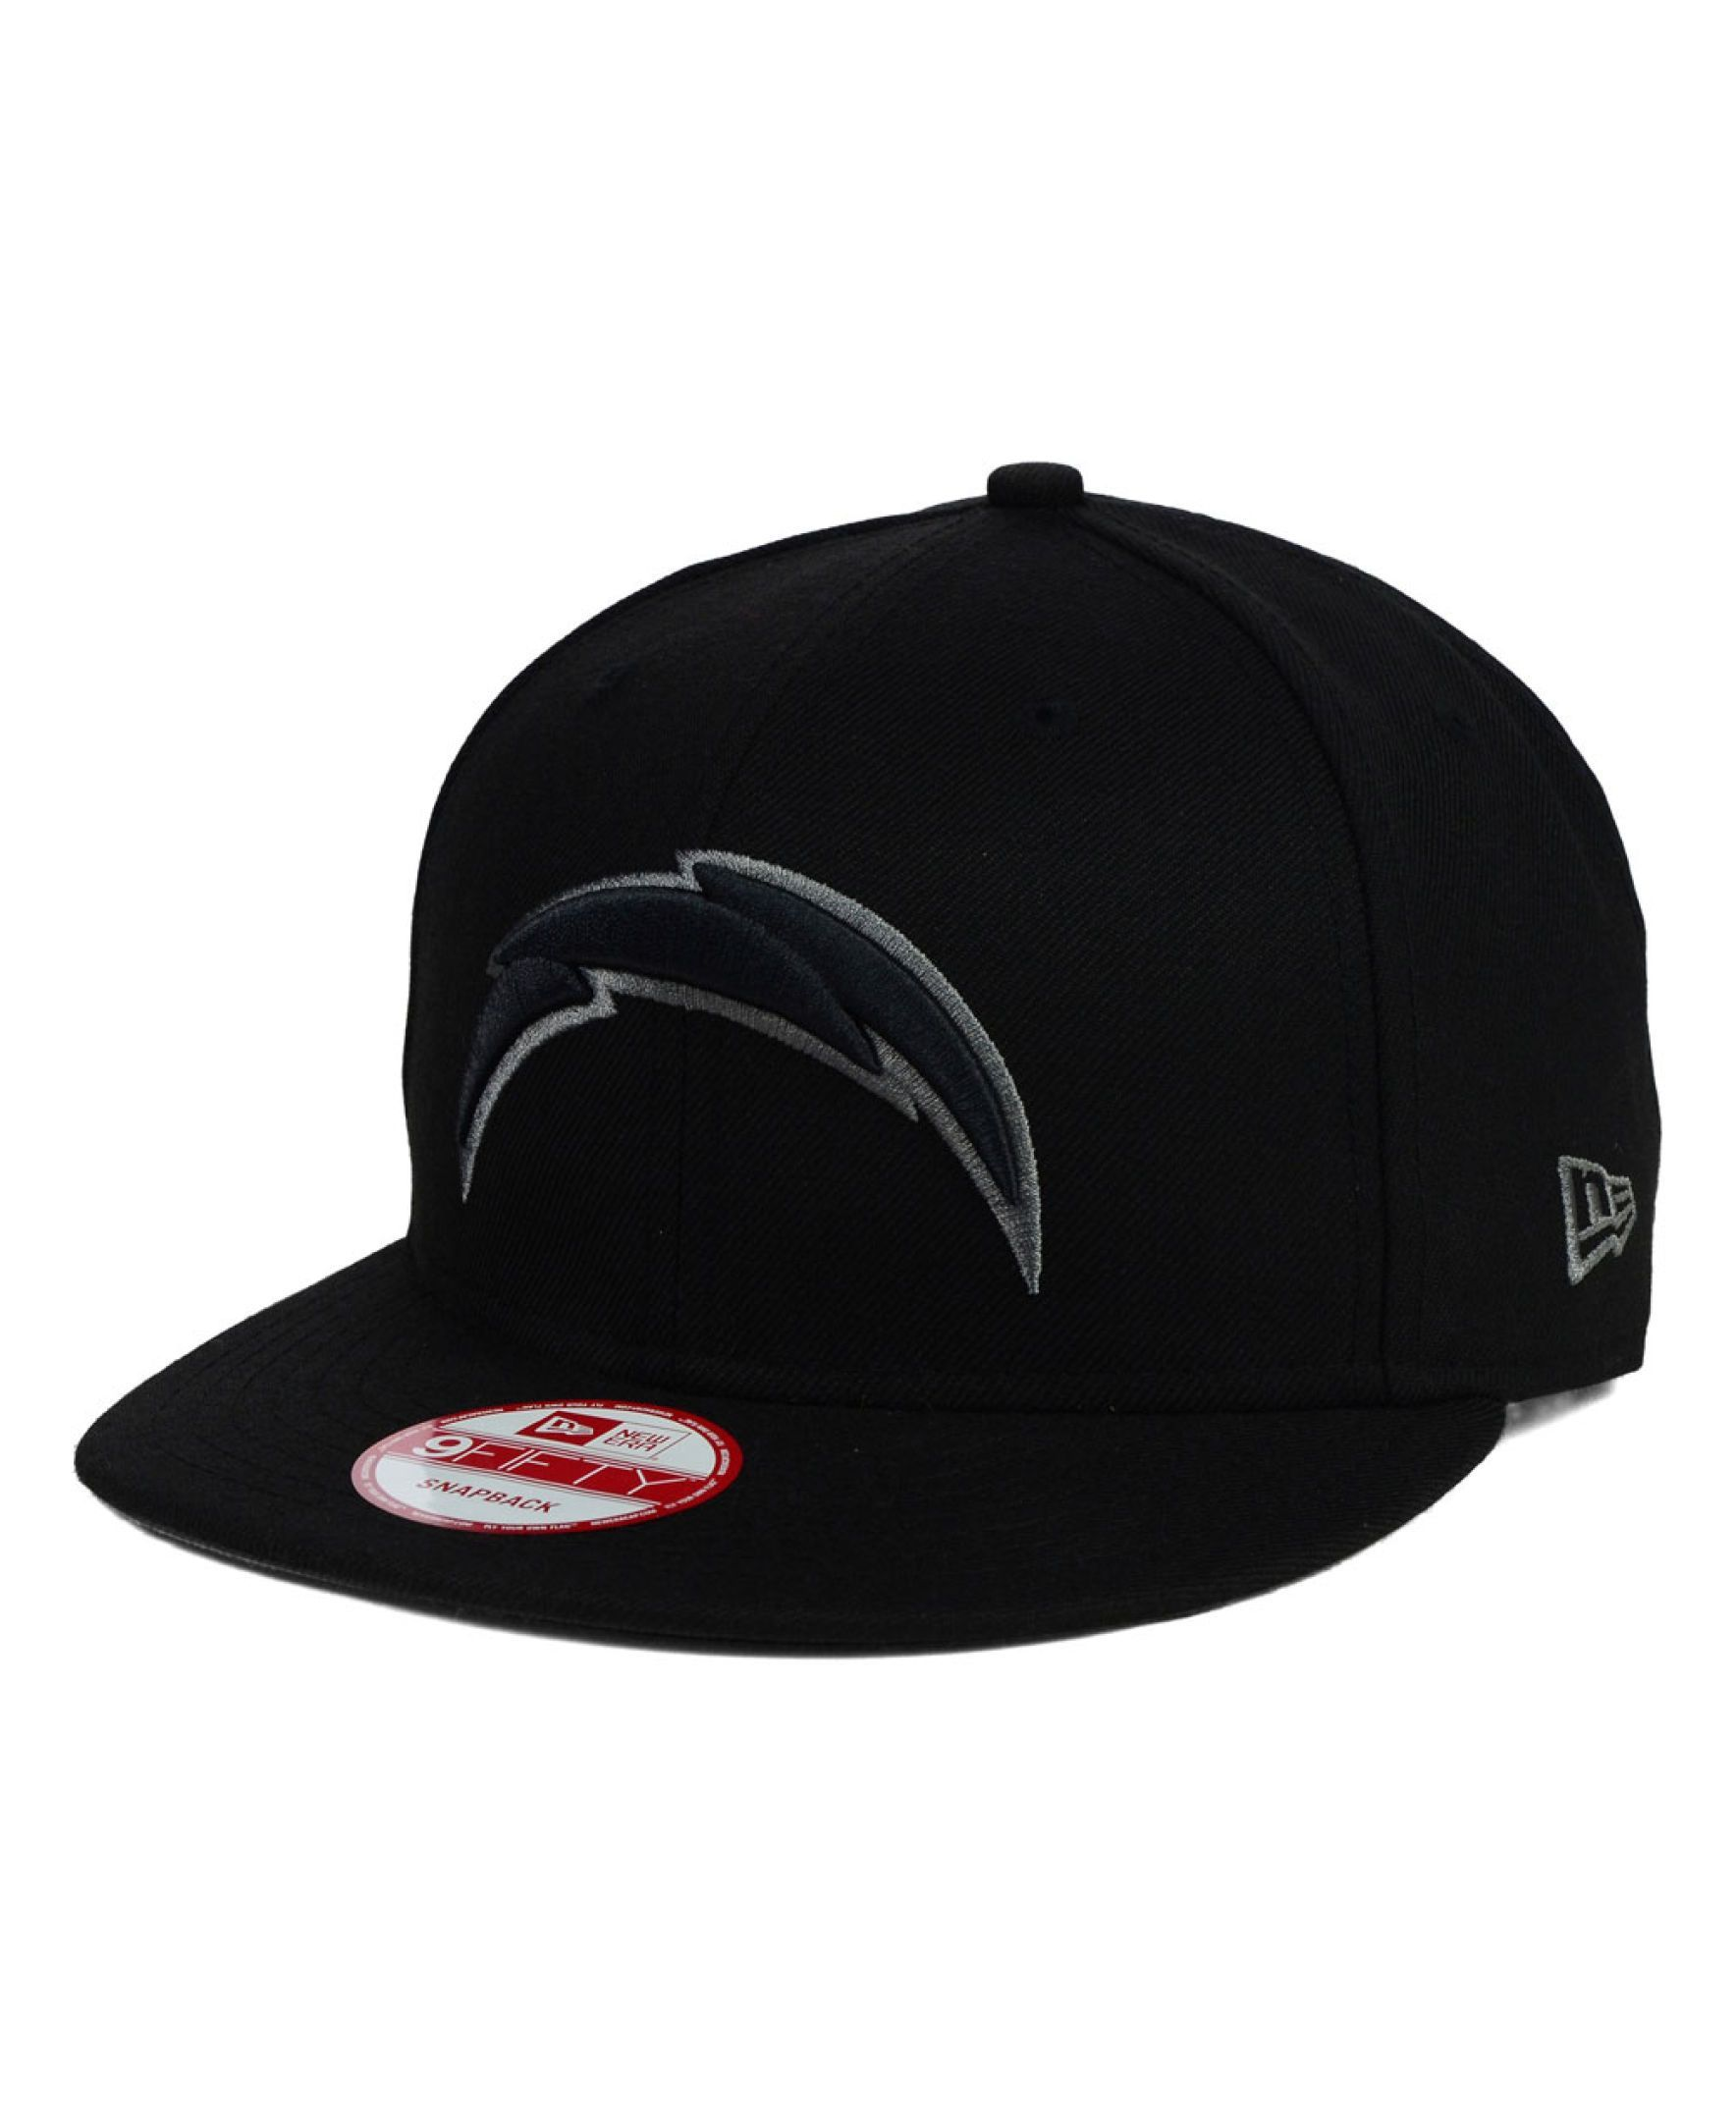 New Era San Diego Chargers Black Gray 9FIFTY Snapback Cap